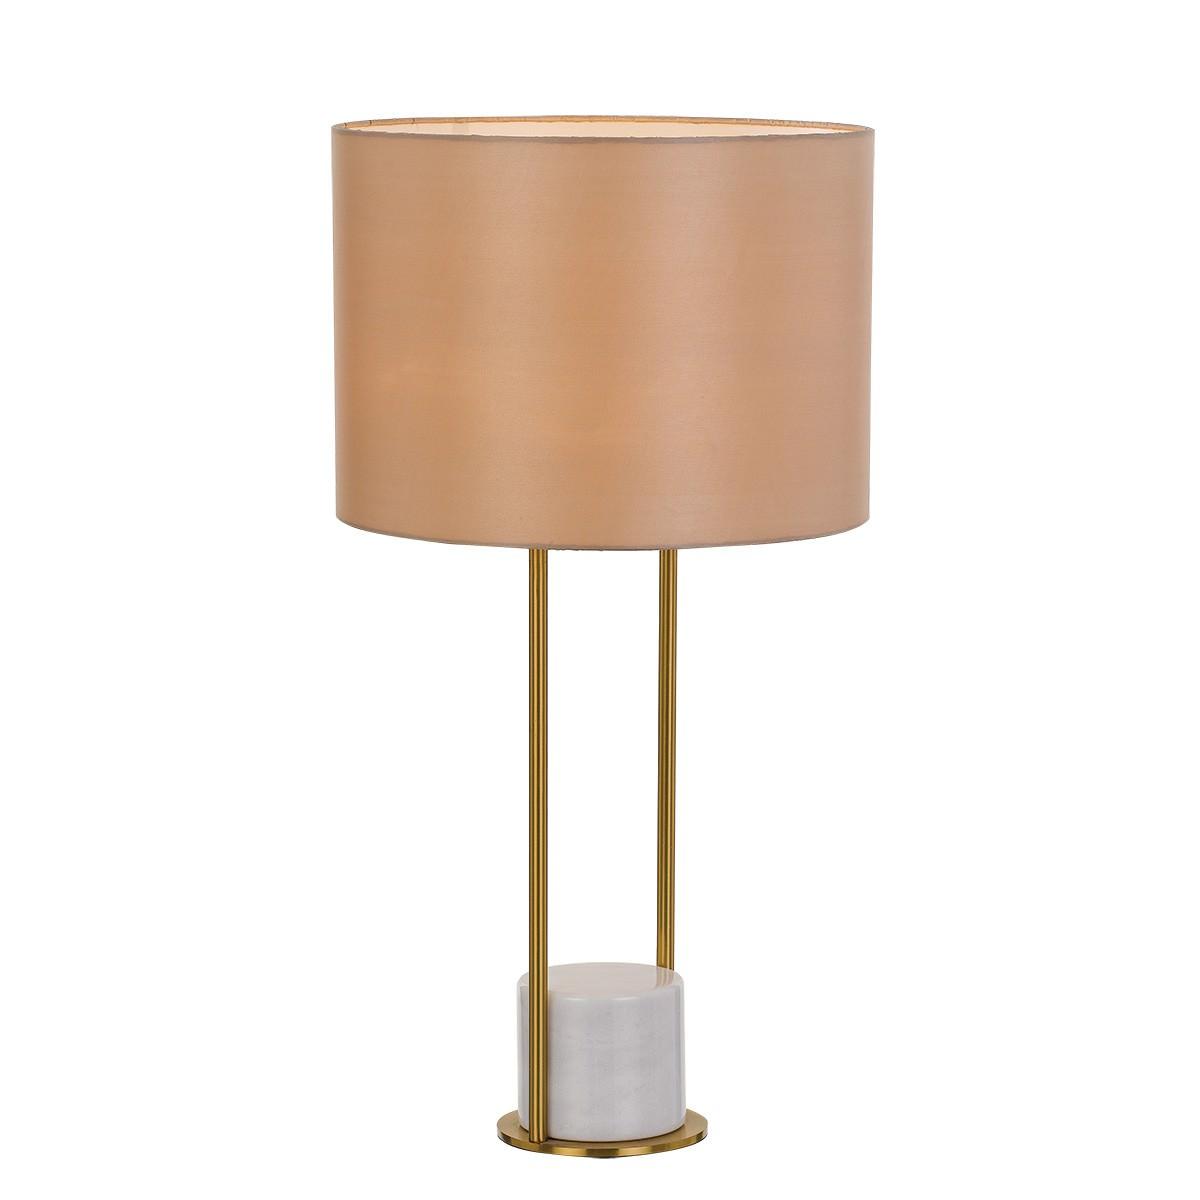 Desire Marble Base Table Lamp, White / Cream